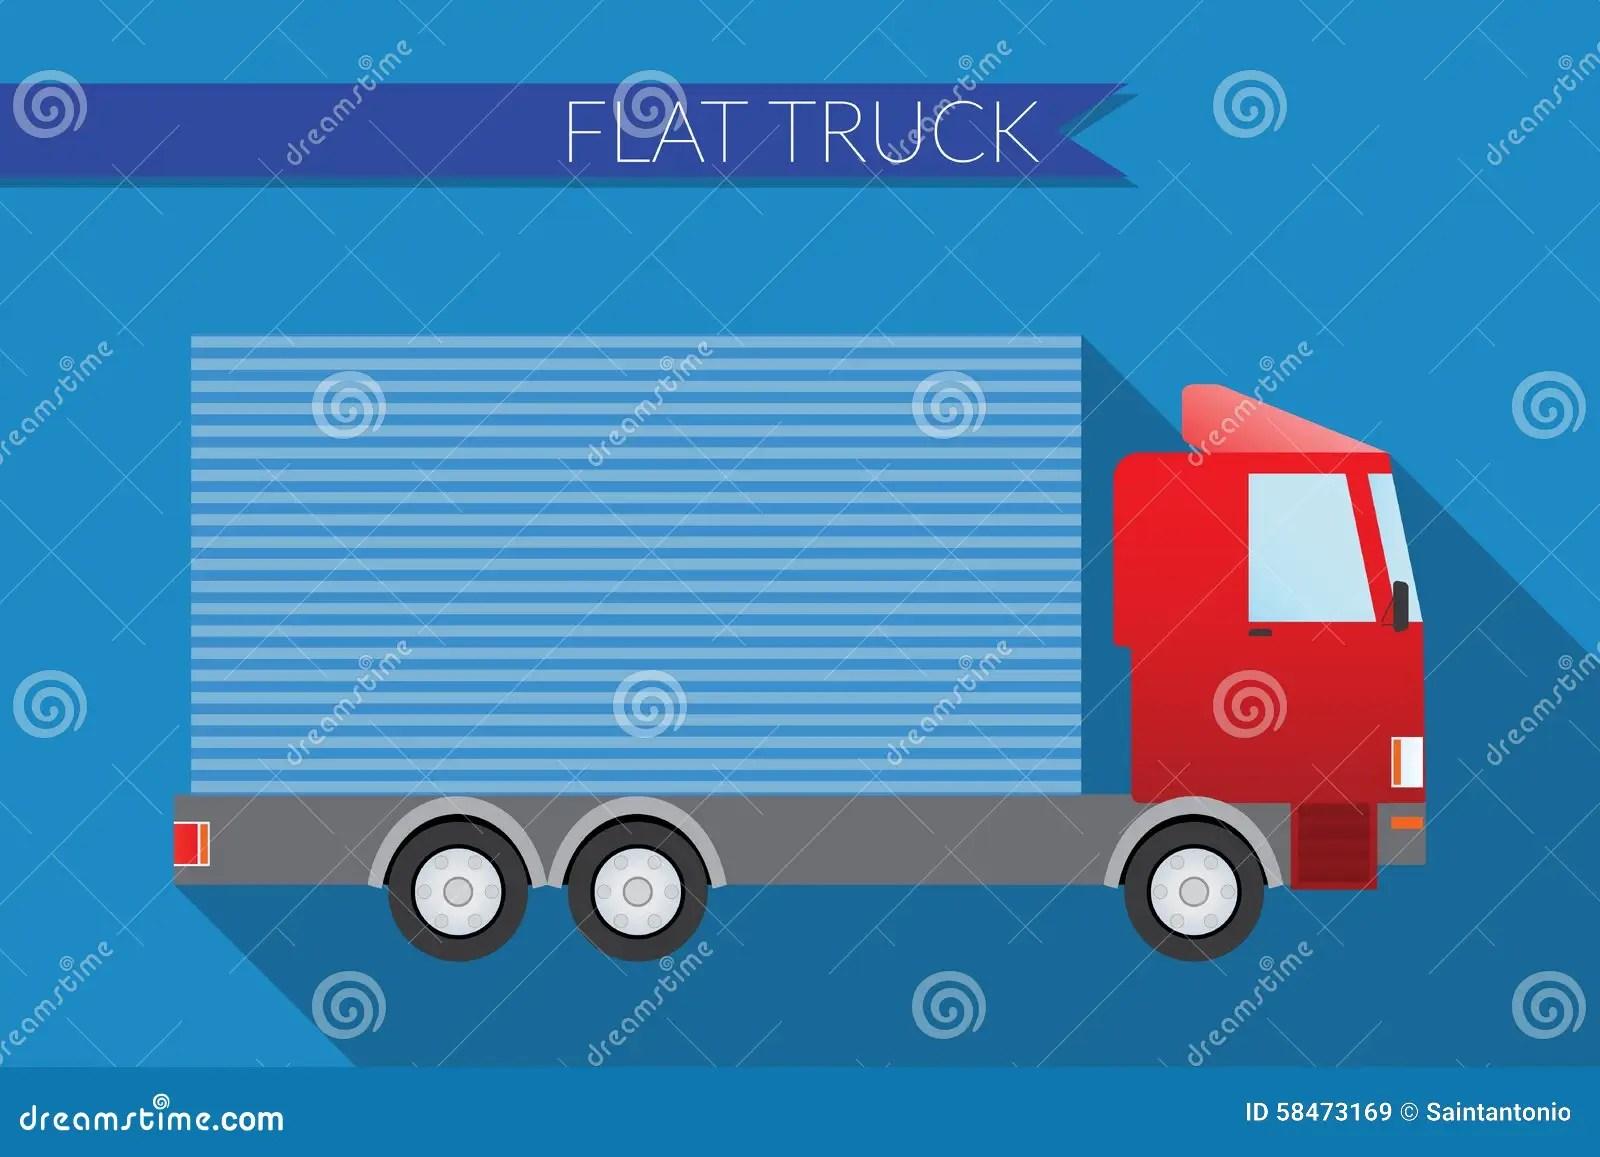 View Mirror Art Side Truck Clip